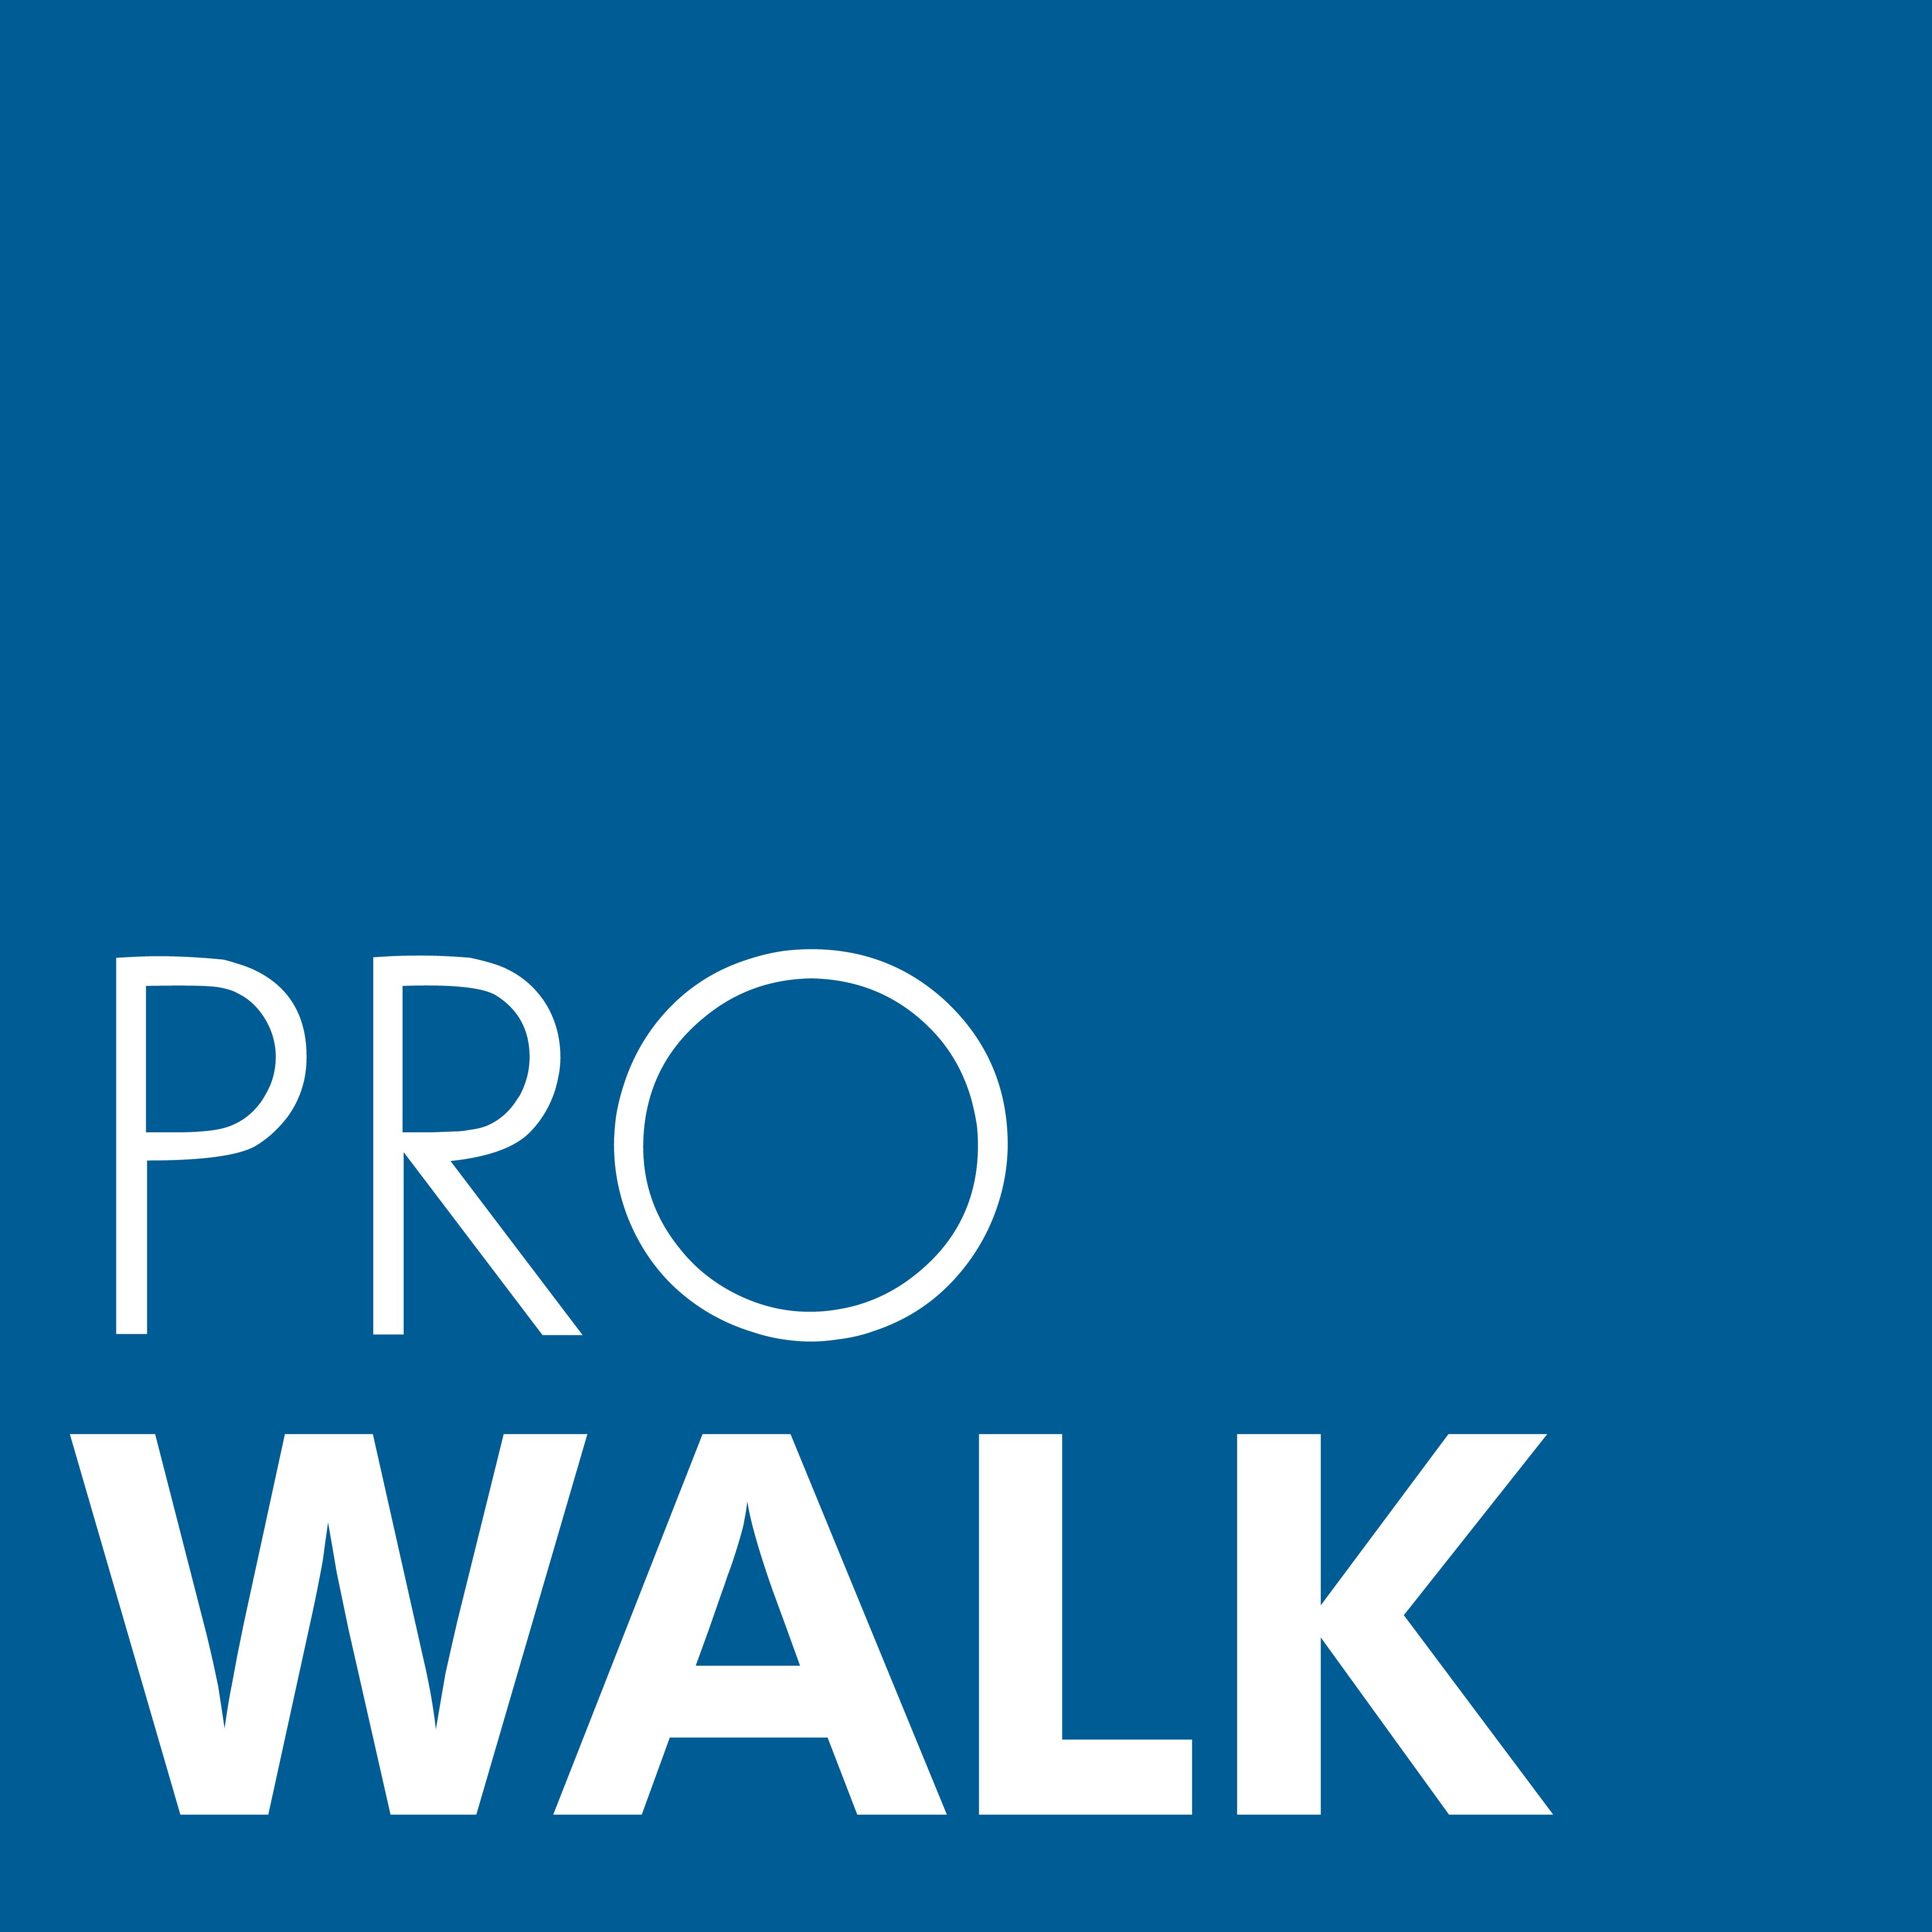 ProWalk - Rehabilitationshilfen und Sanitätsbedarf